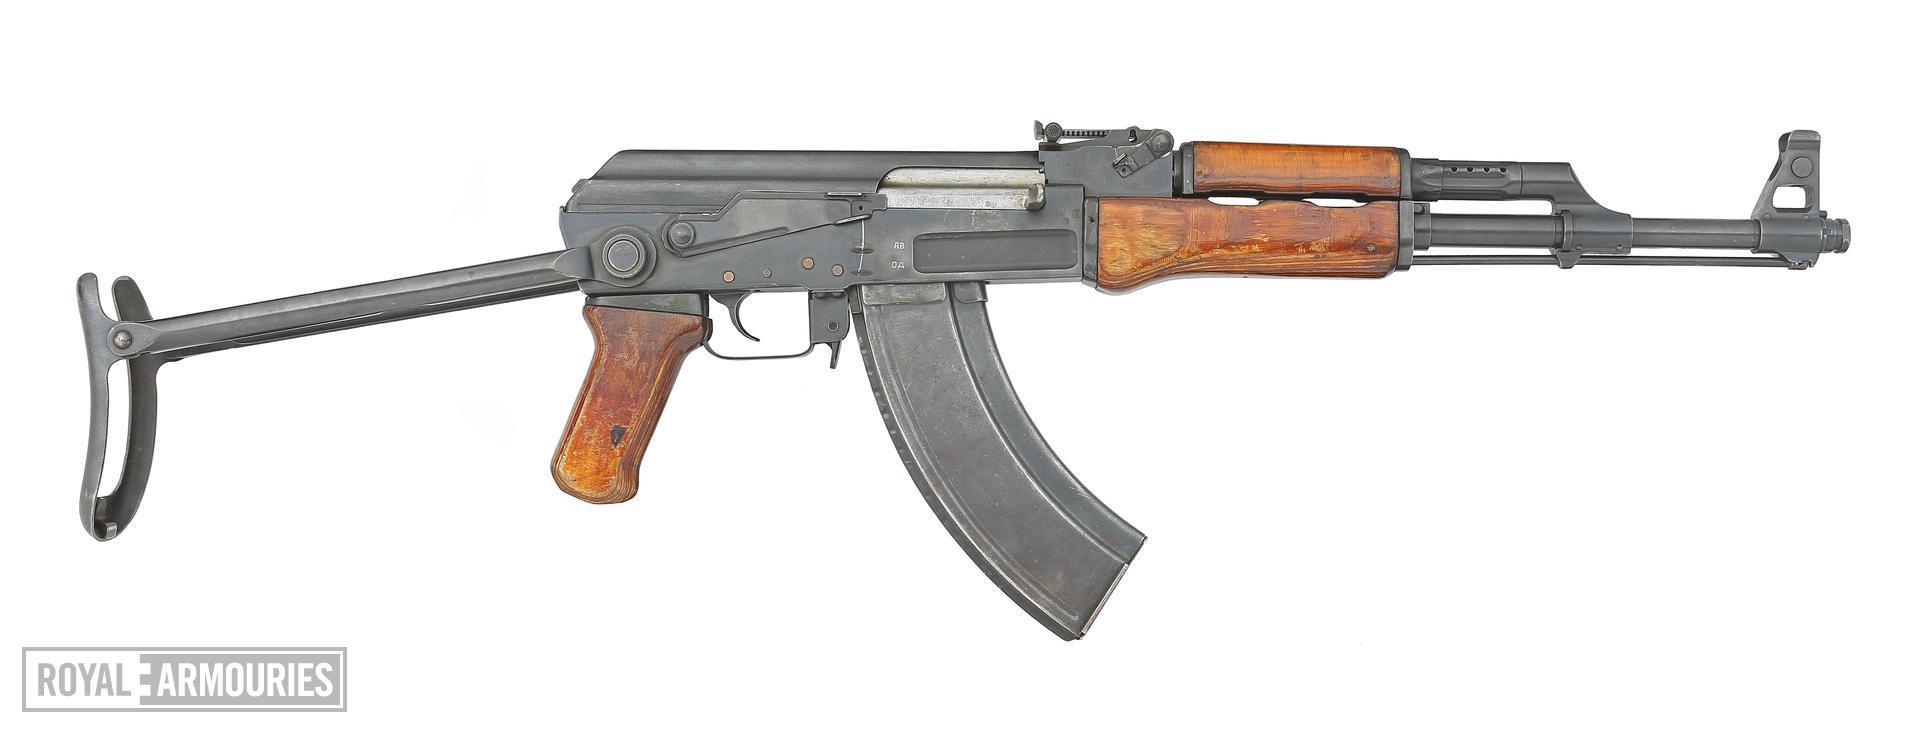 Centrefire automatic rifle - Kalashnikov AKS-47